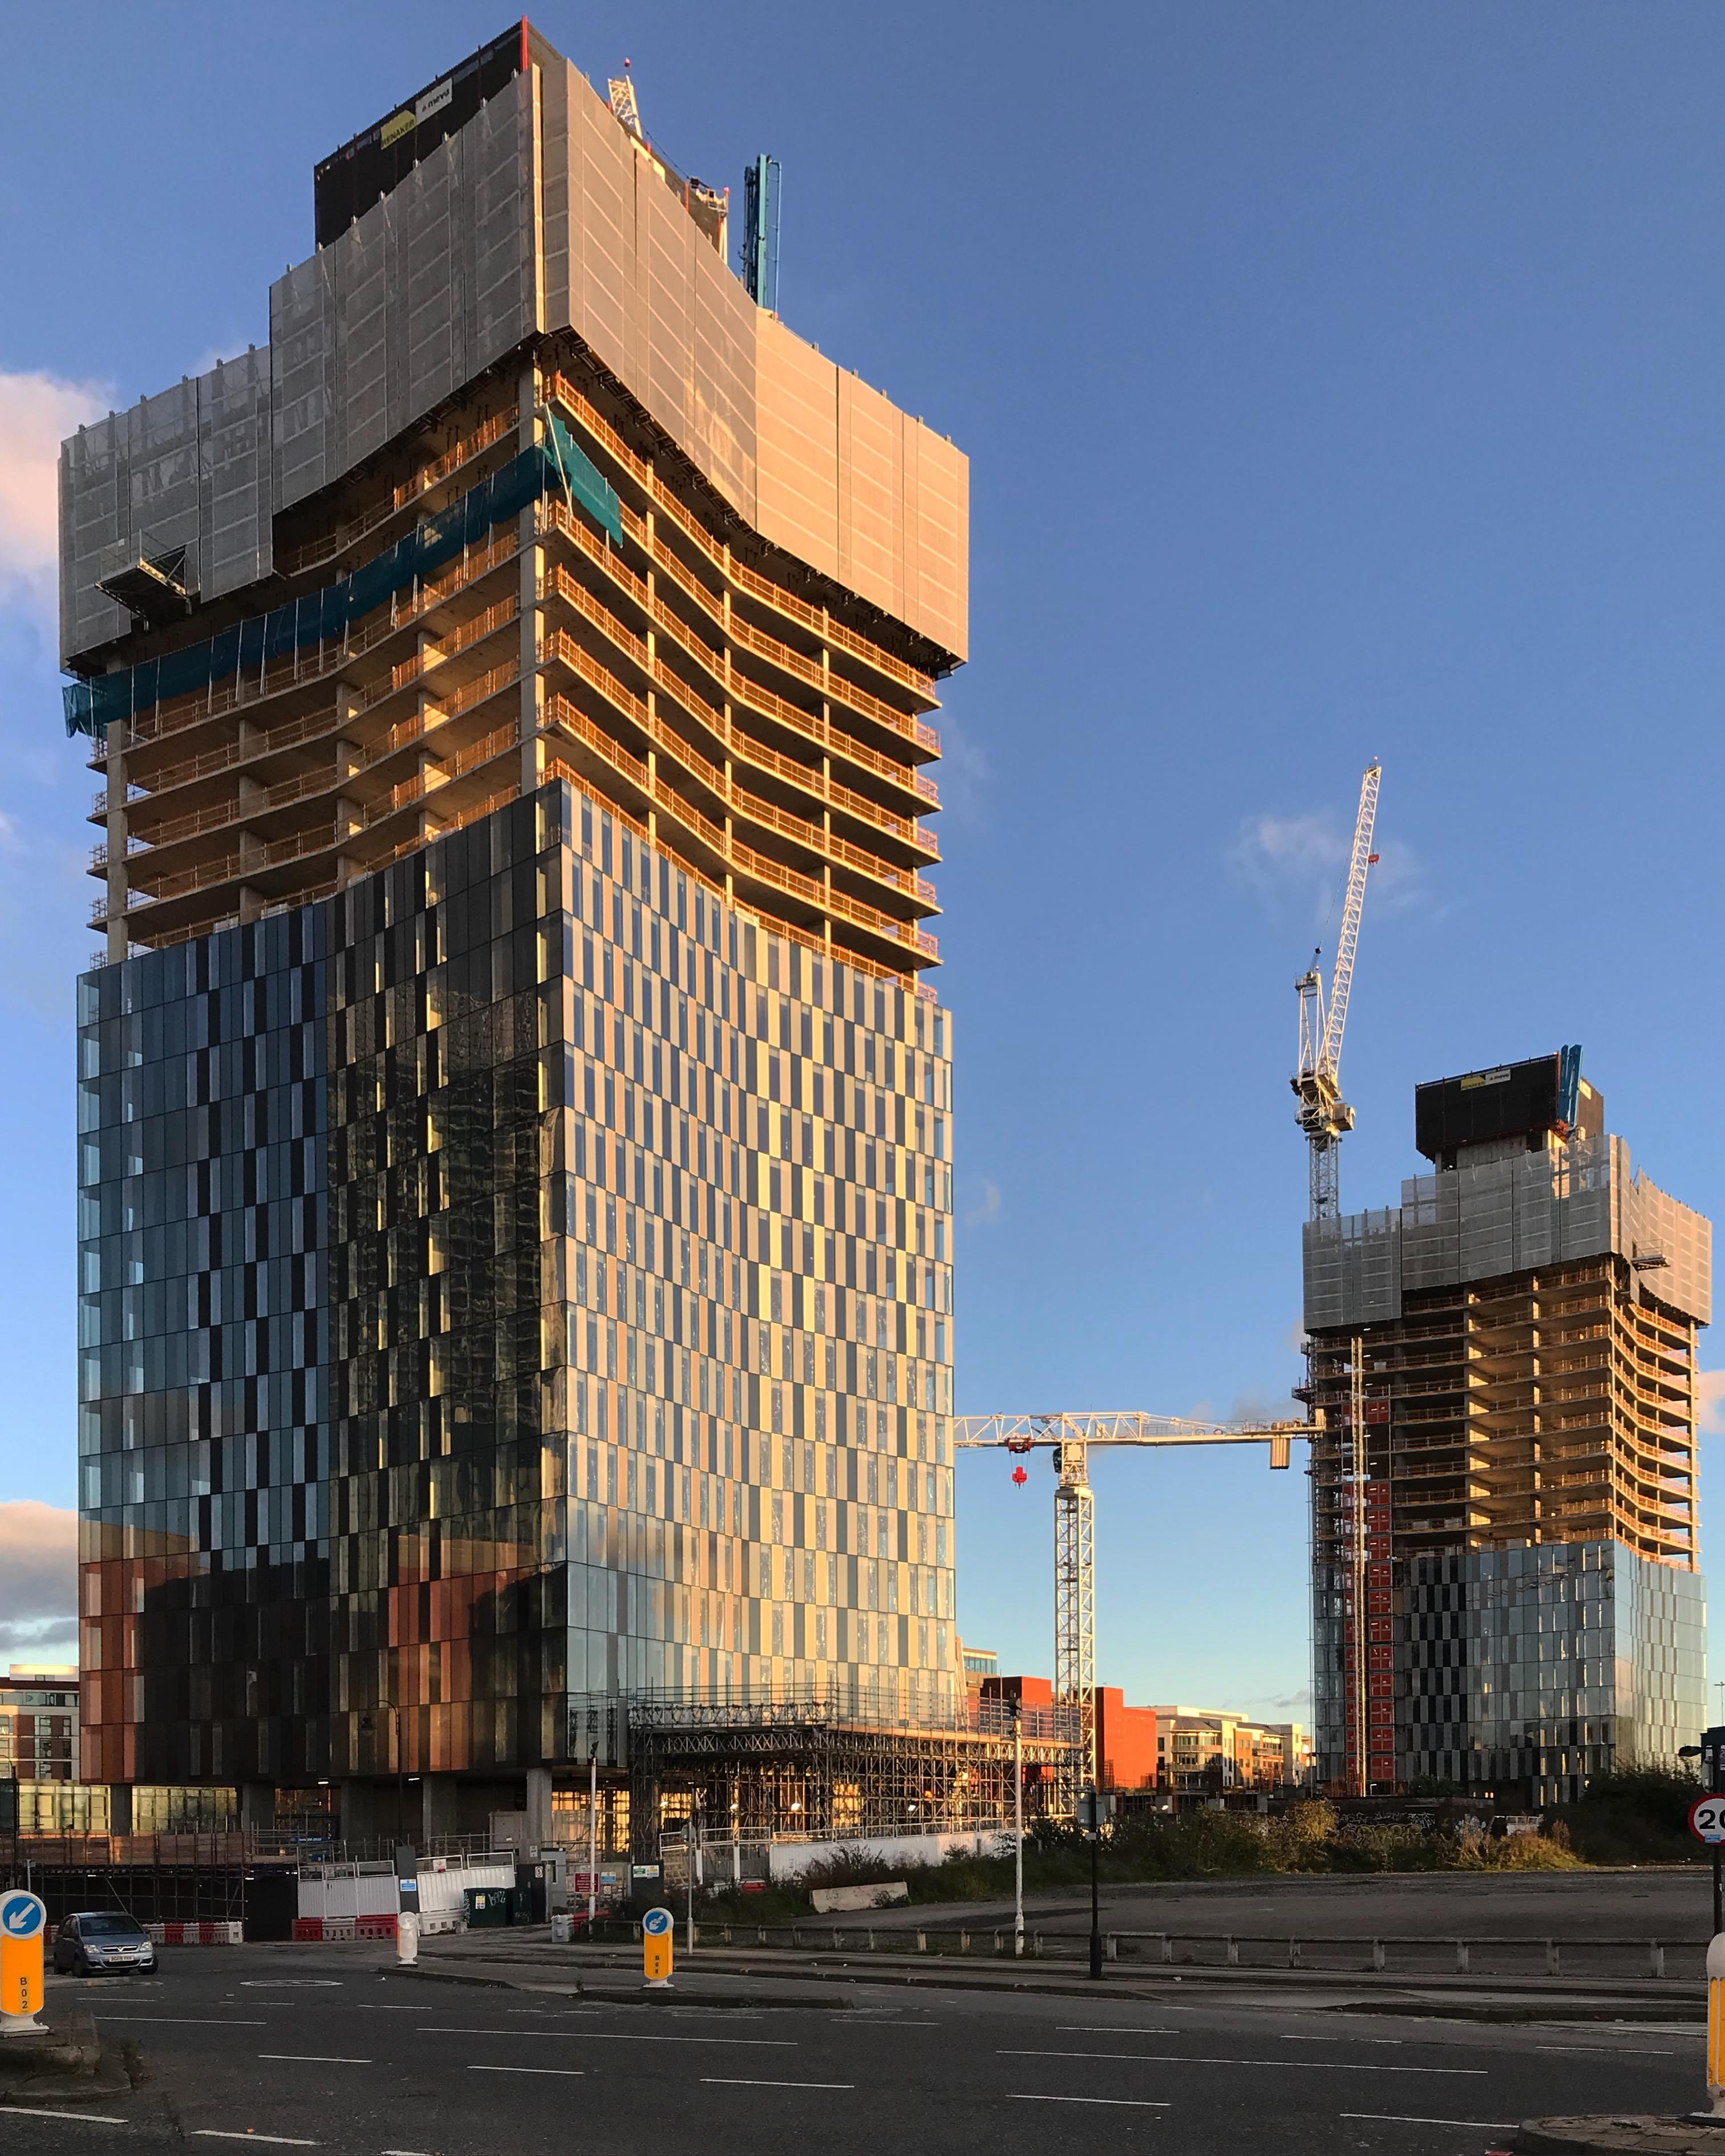 Owen S Building Manchester